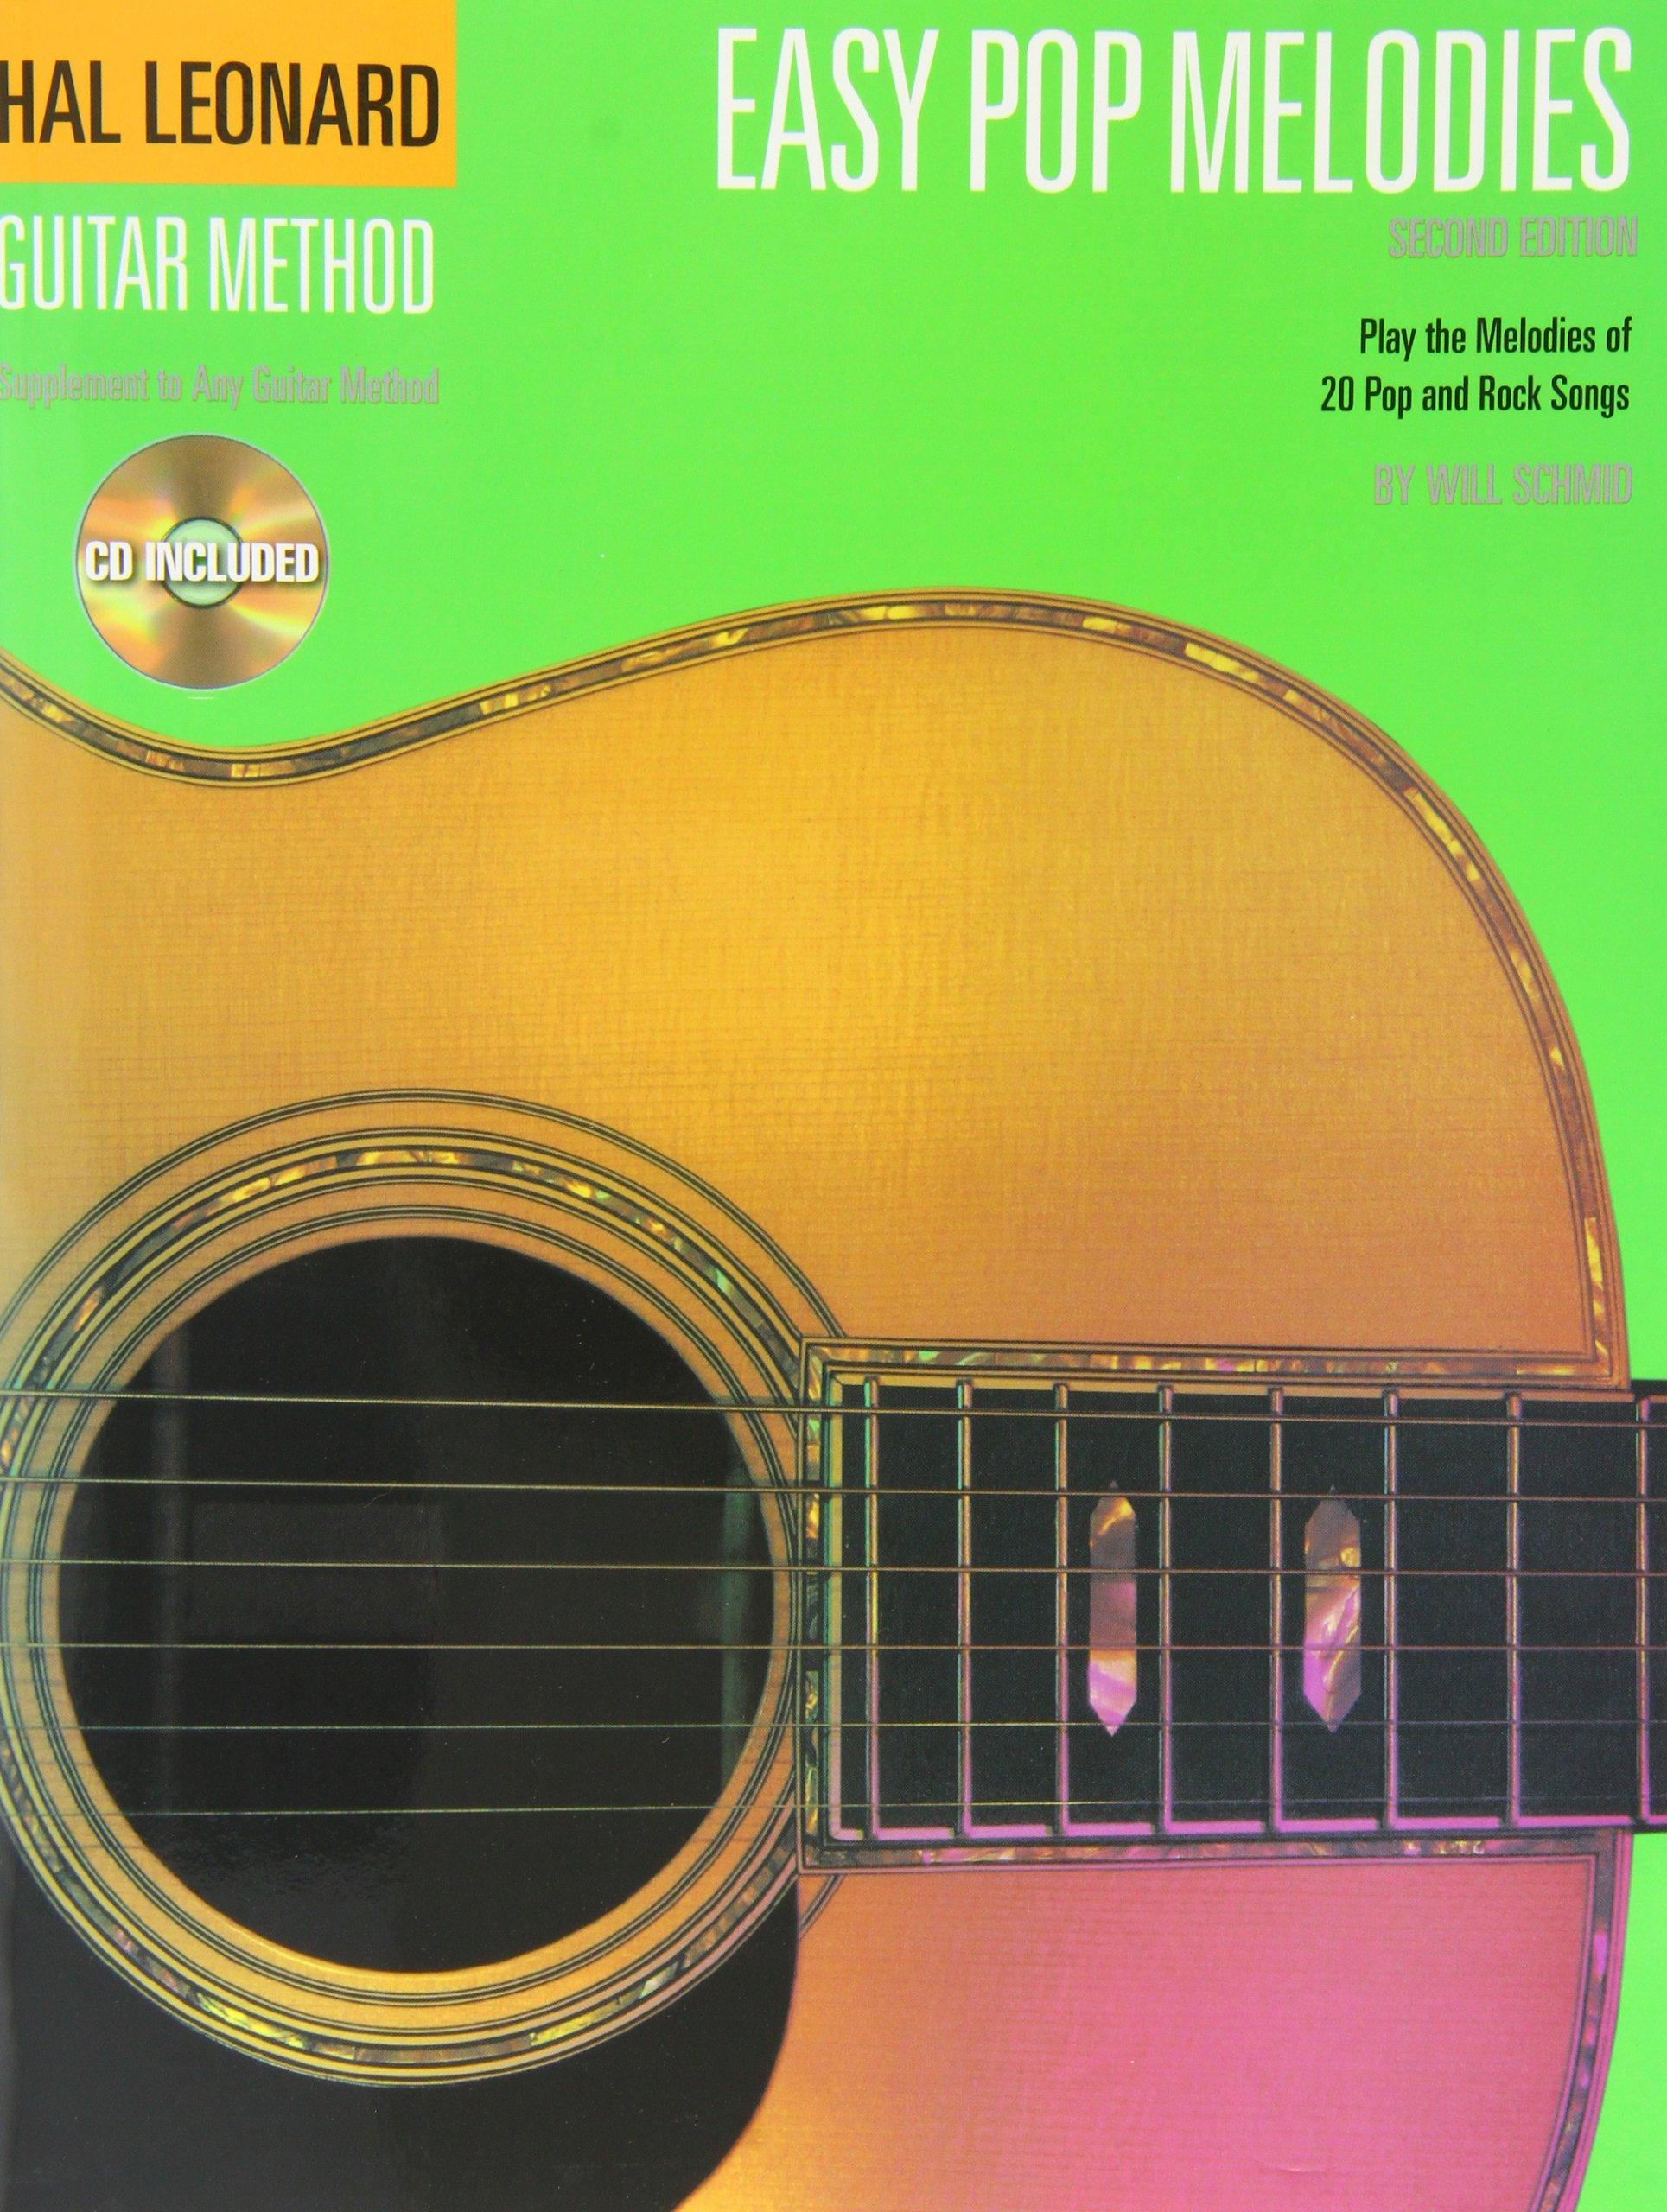 Hal Leonard Guitar Method: Easy Pop Melodies (CD Edition) PDF